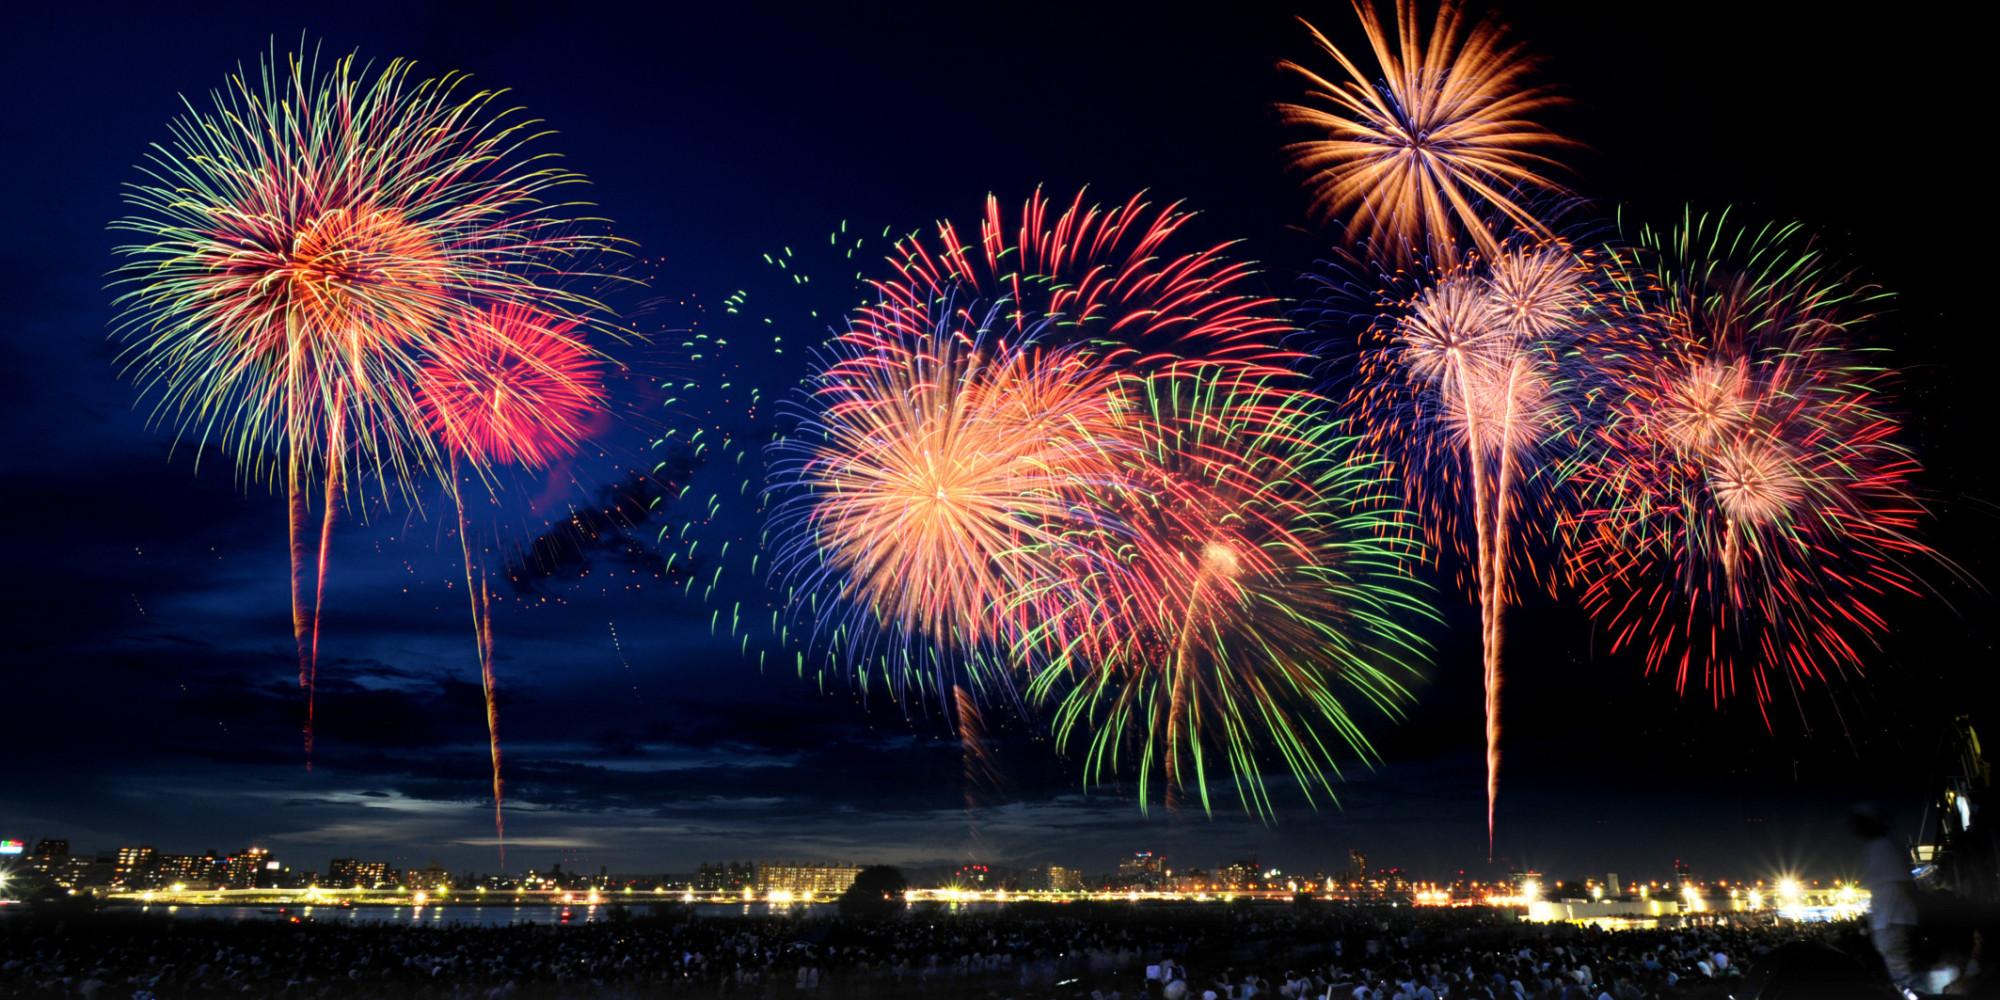 High Resolution Wallpaper | Fireworks 2000x1000 px